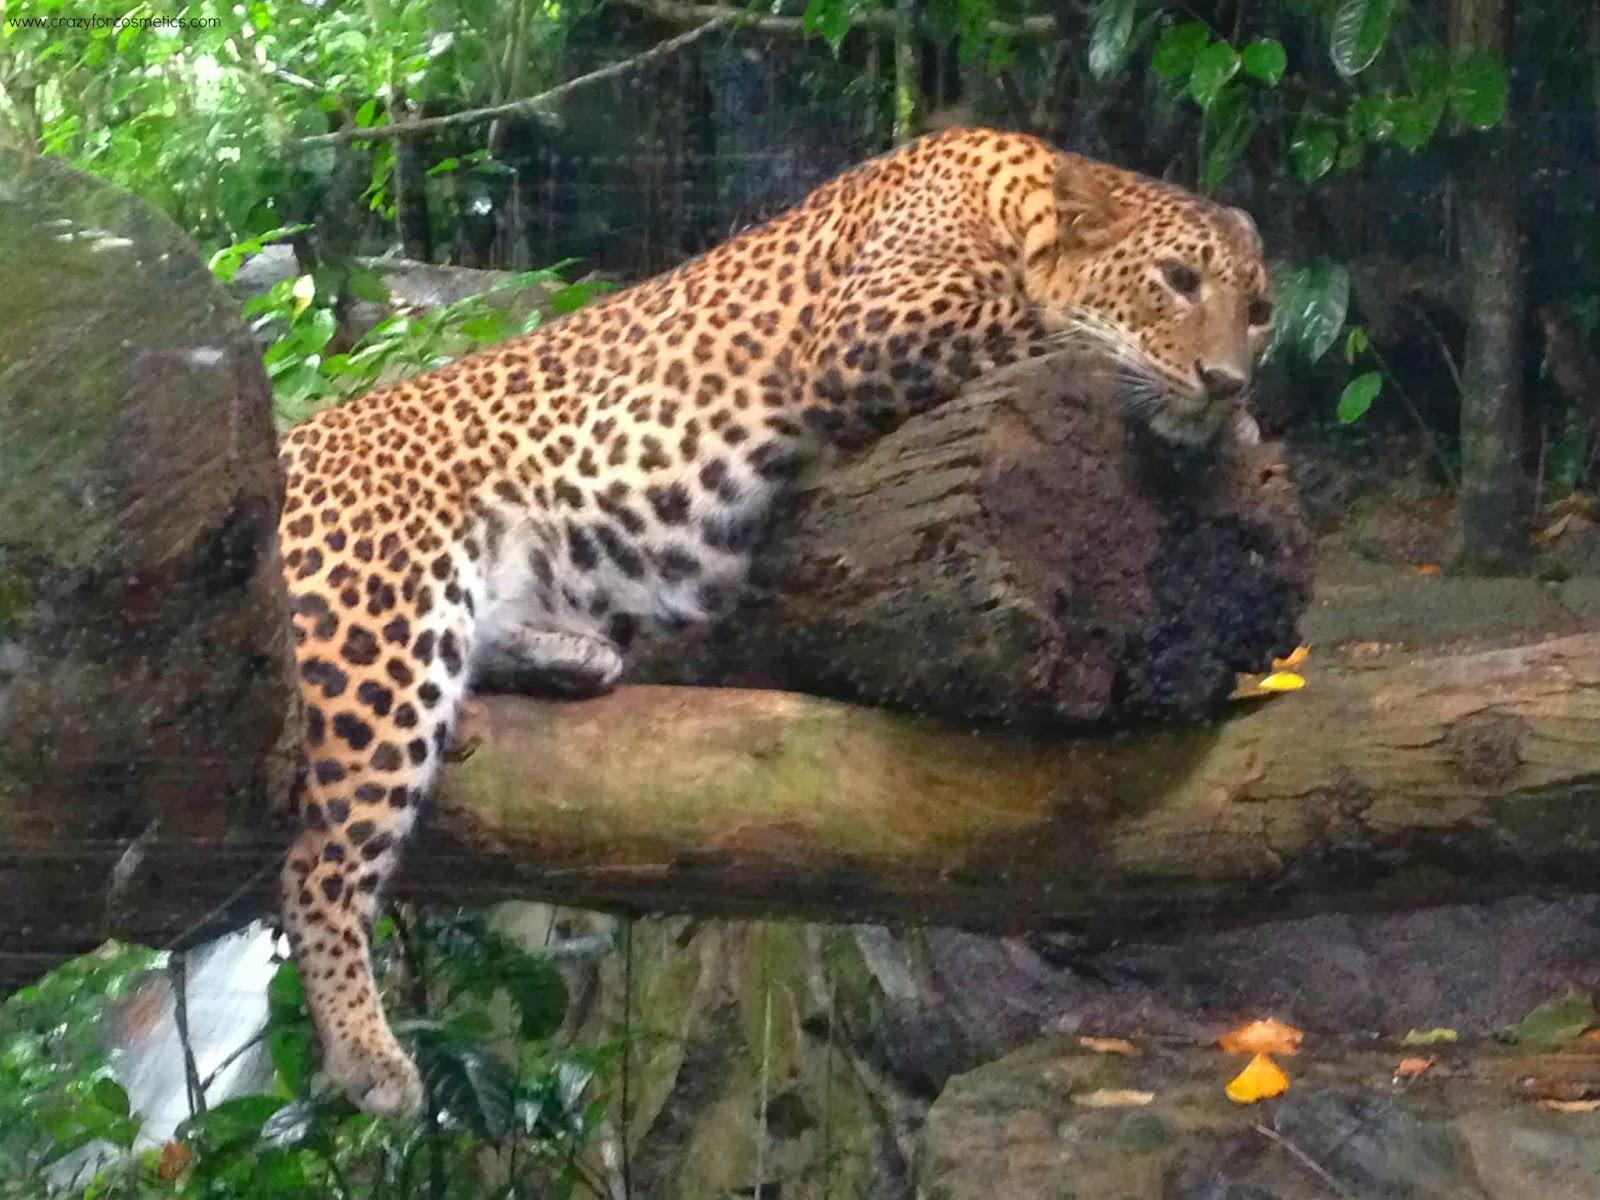 Singapore Zoo Safari-Singapore Zoo review